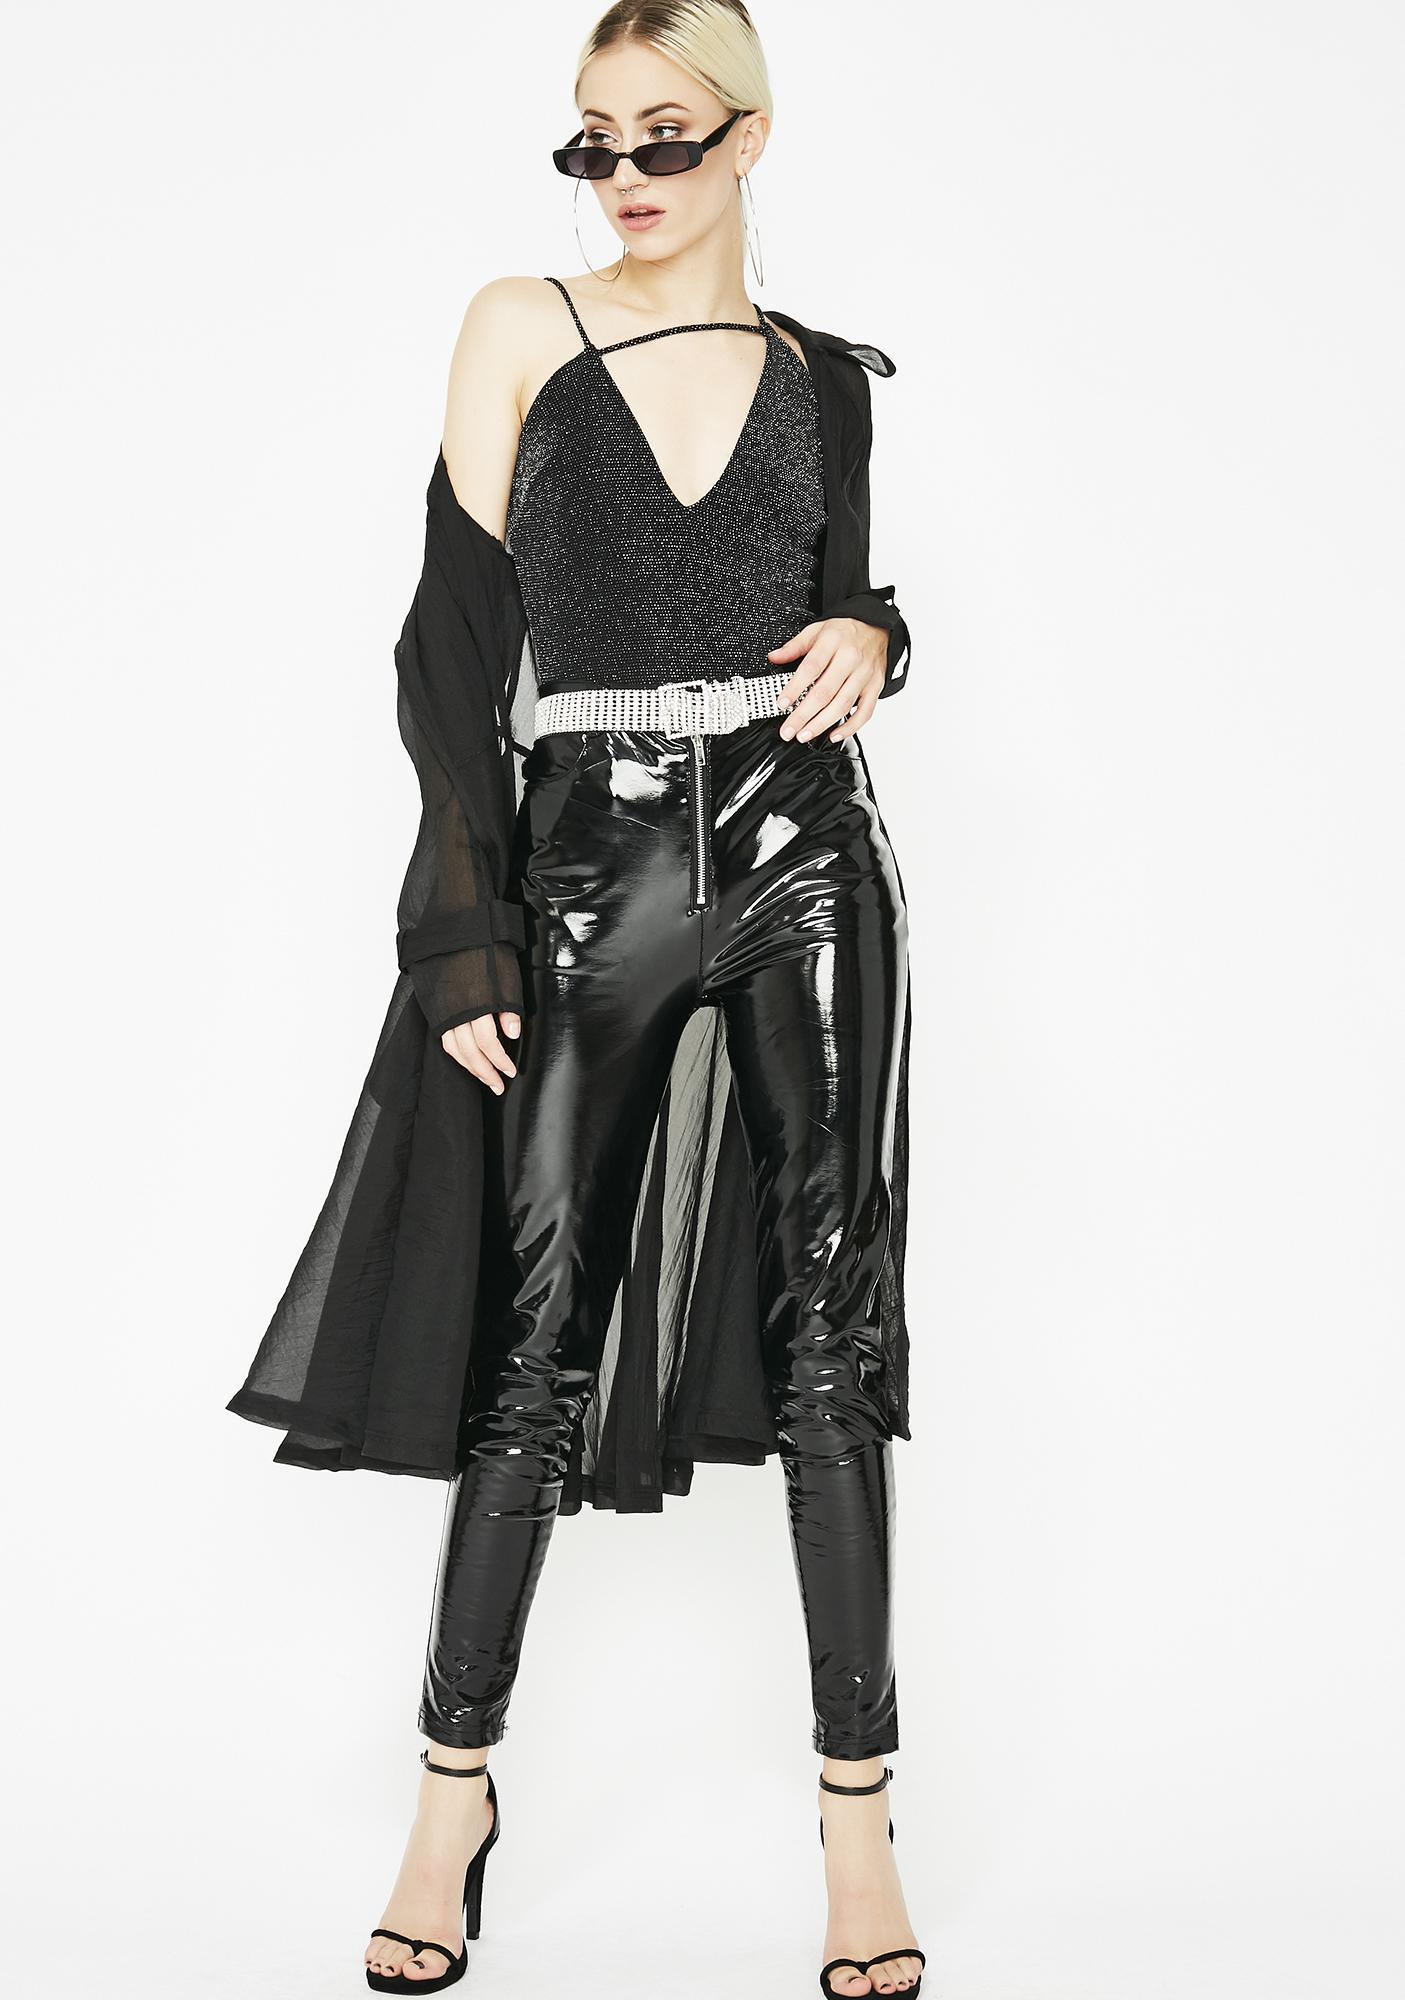 Lucky Star Asymmetrical Bodysuit